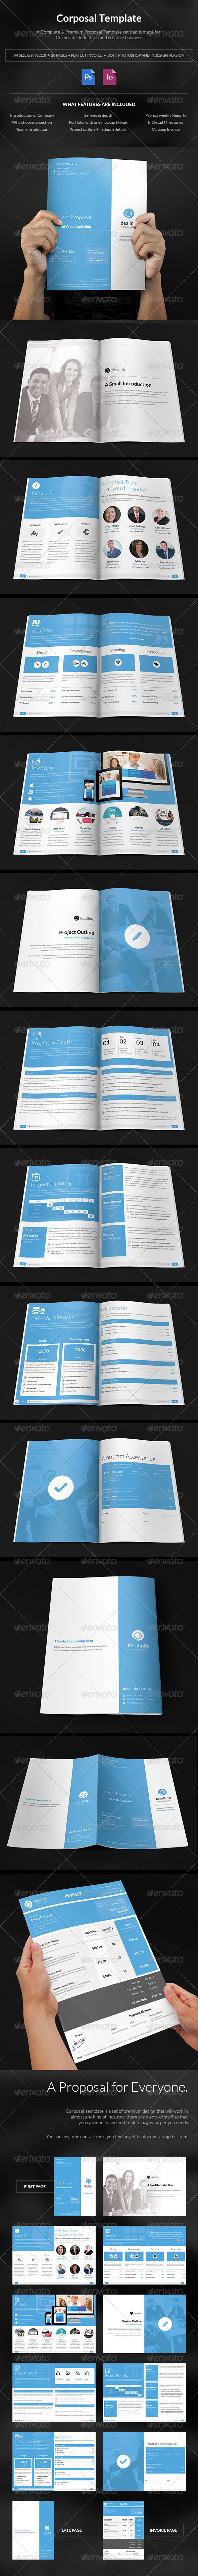 GraphicRiver Corposal A Corporate Porposal Template 6329691